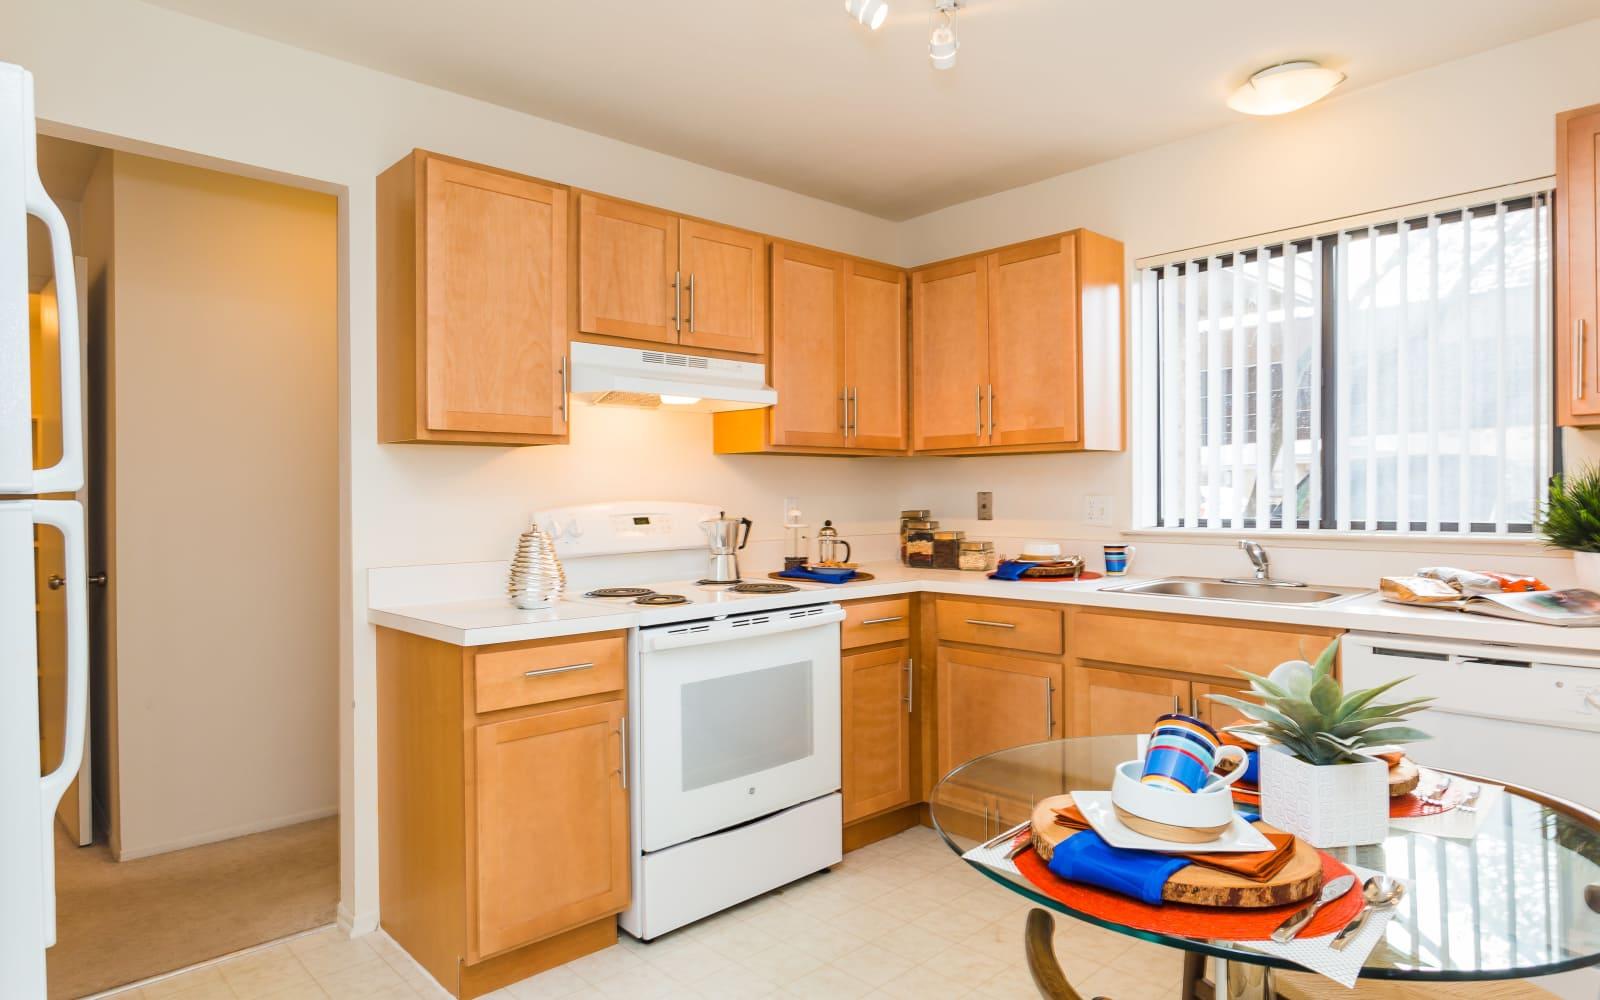 A view of the kitchen at Fairmont Park Apartments in Farmington Hills, Michigan